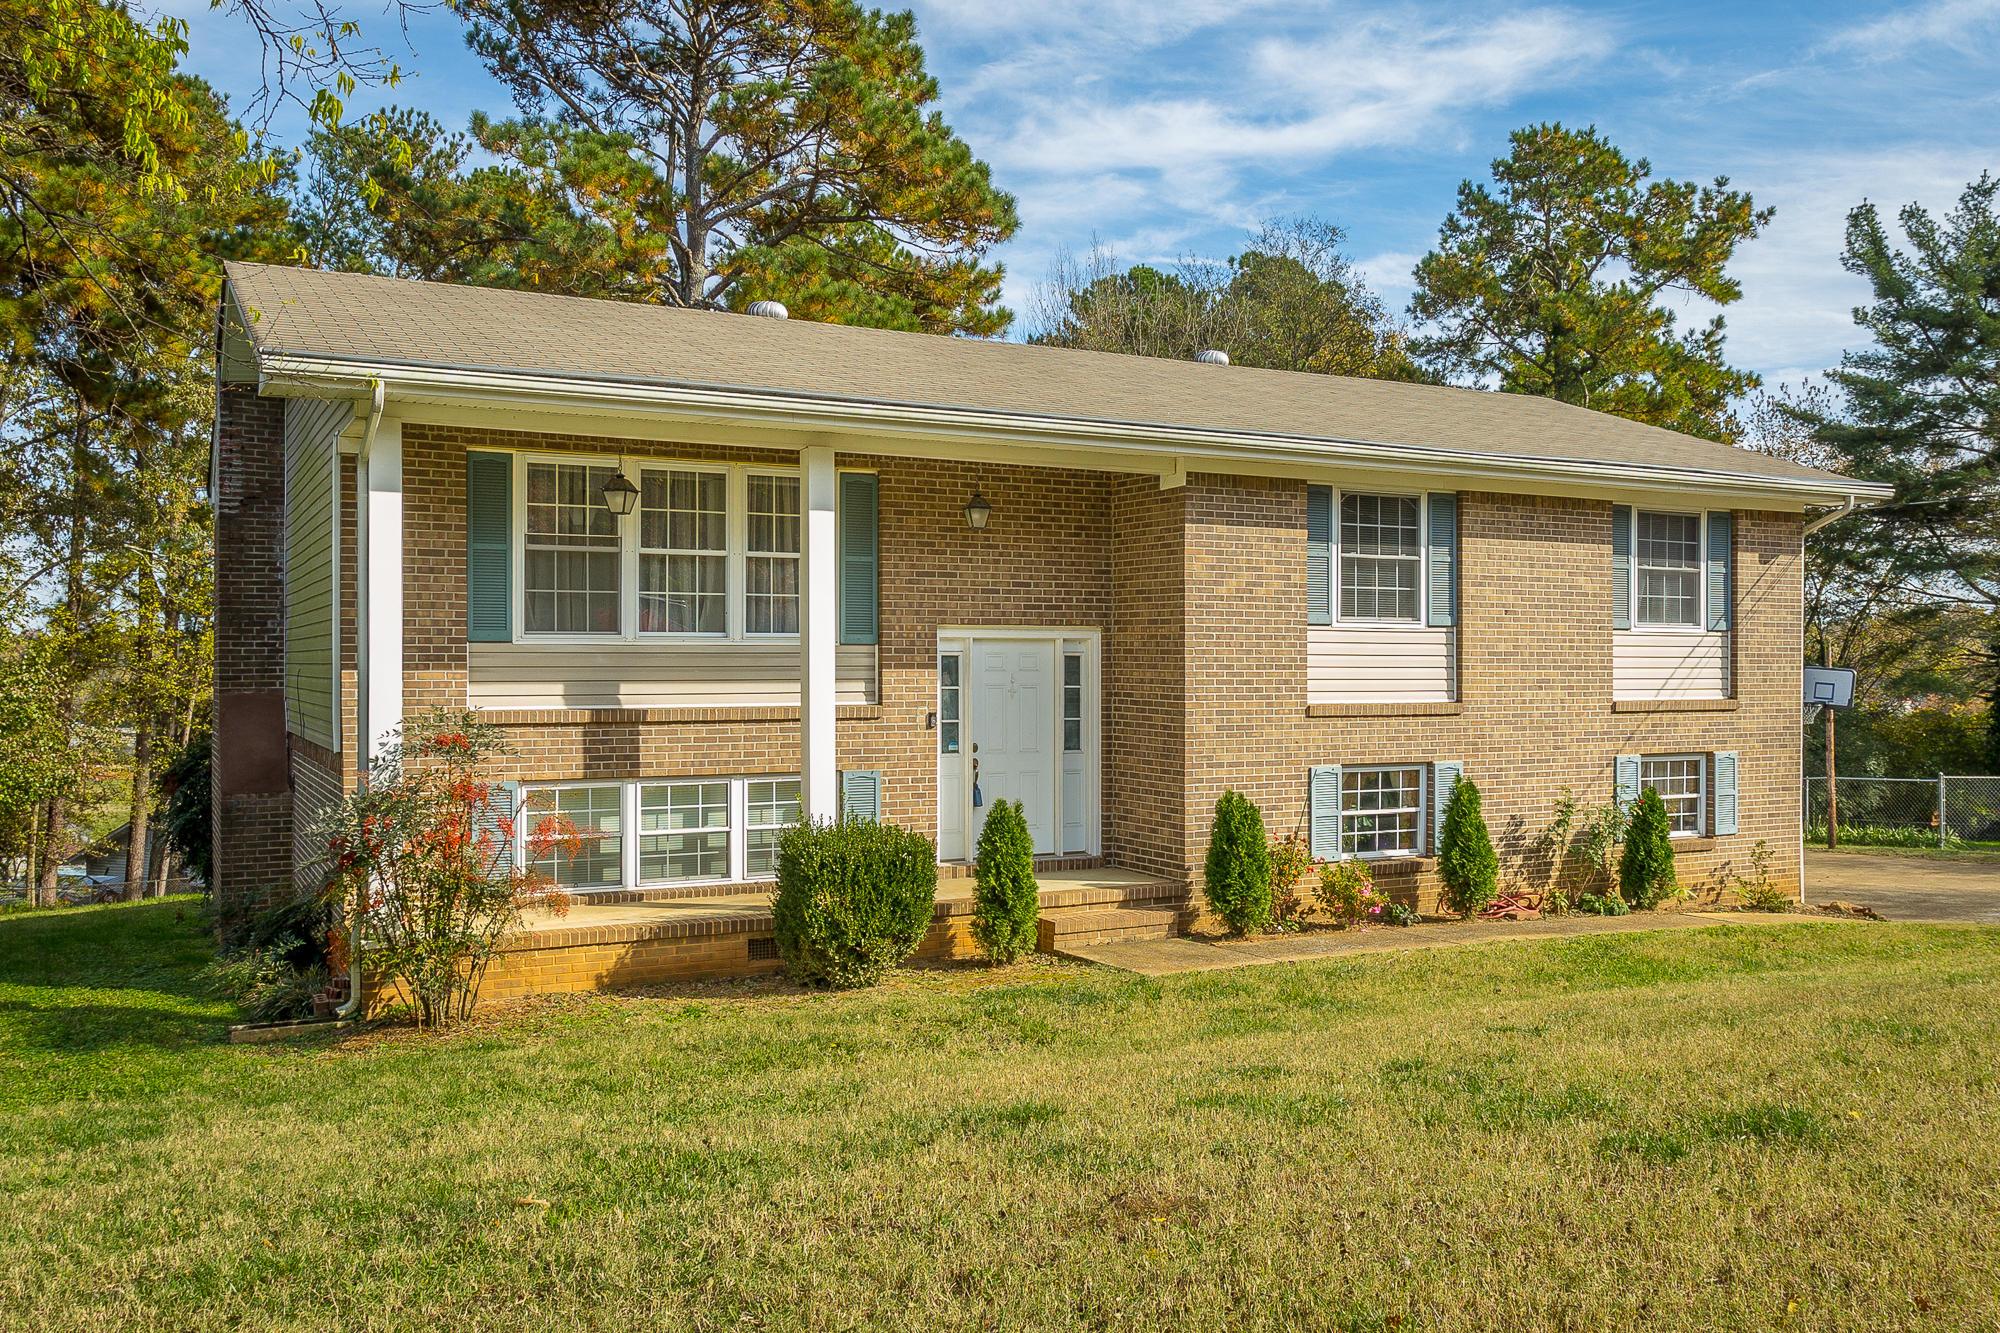 1447 Marijon Dr, Chattanooga, TN 37421